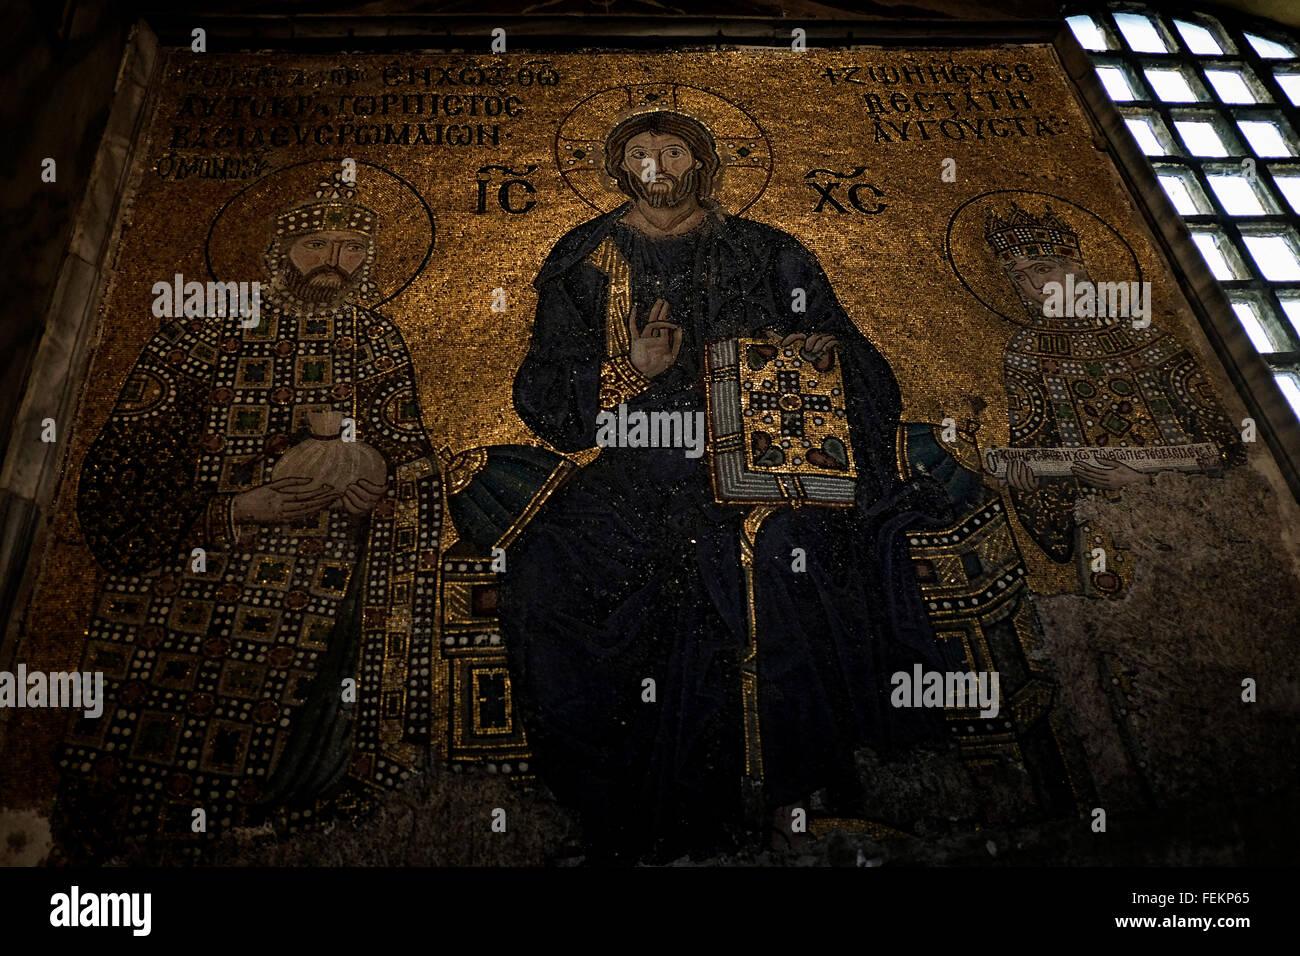 Mosaic depicting Jesus Christ, Hagia Sofia, Istanbul. May 3, 2015. Stock Photo